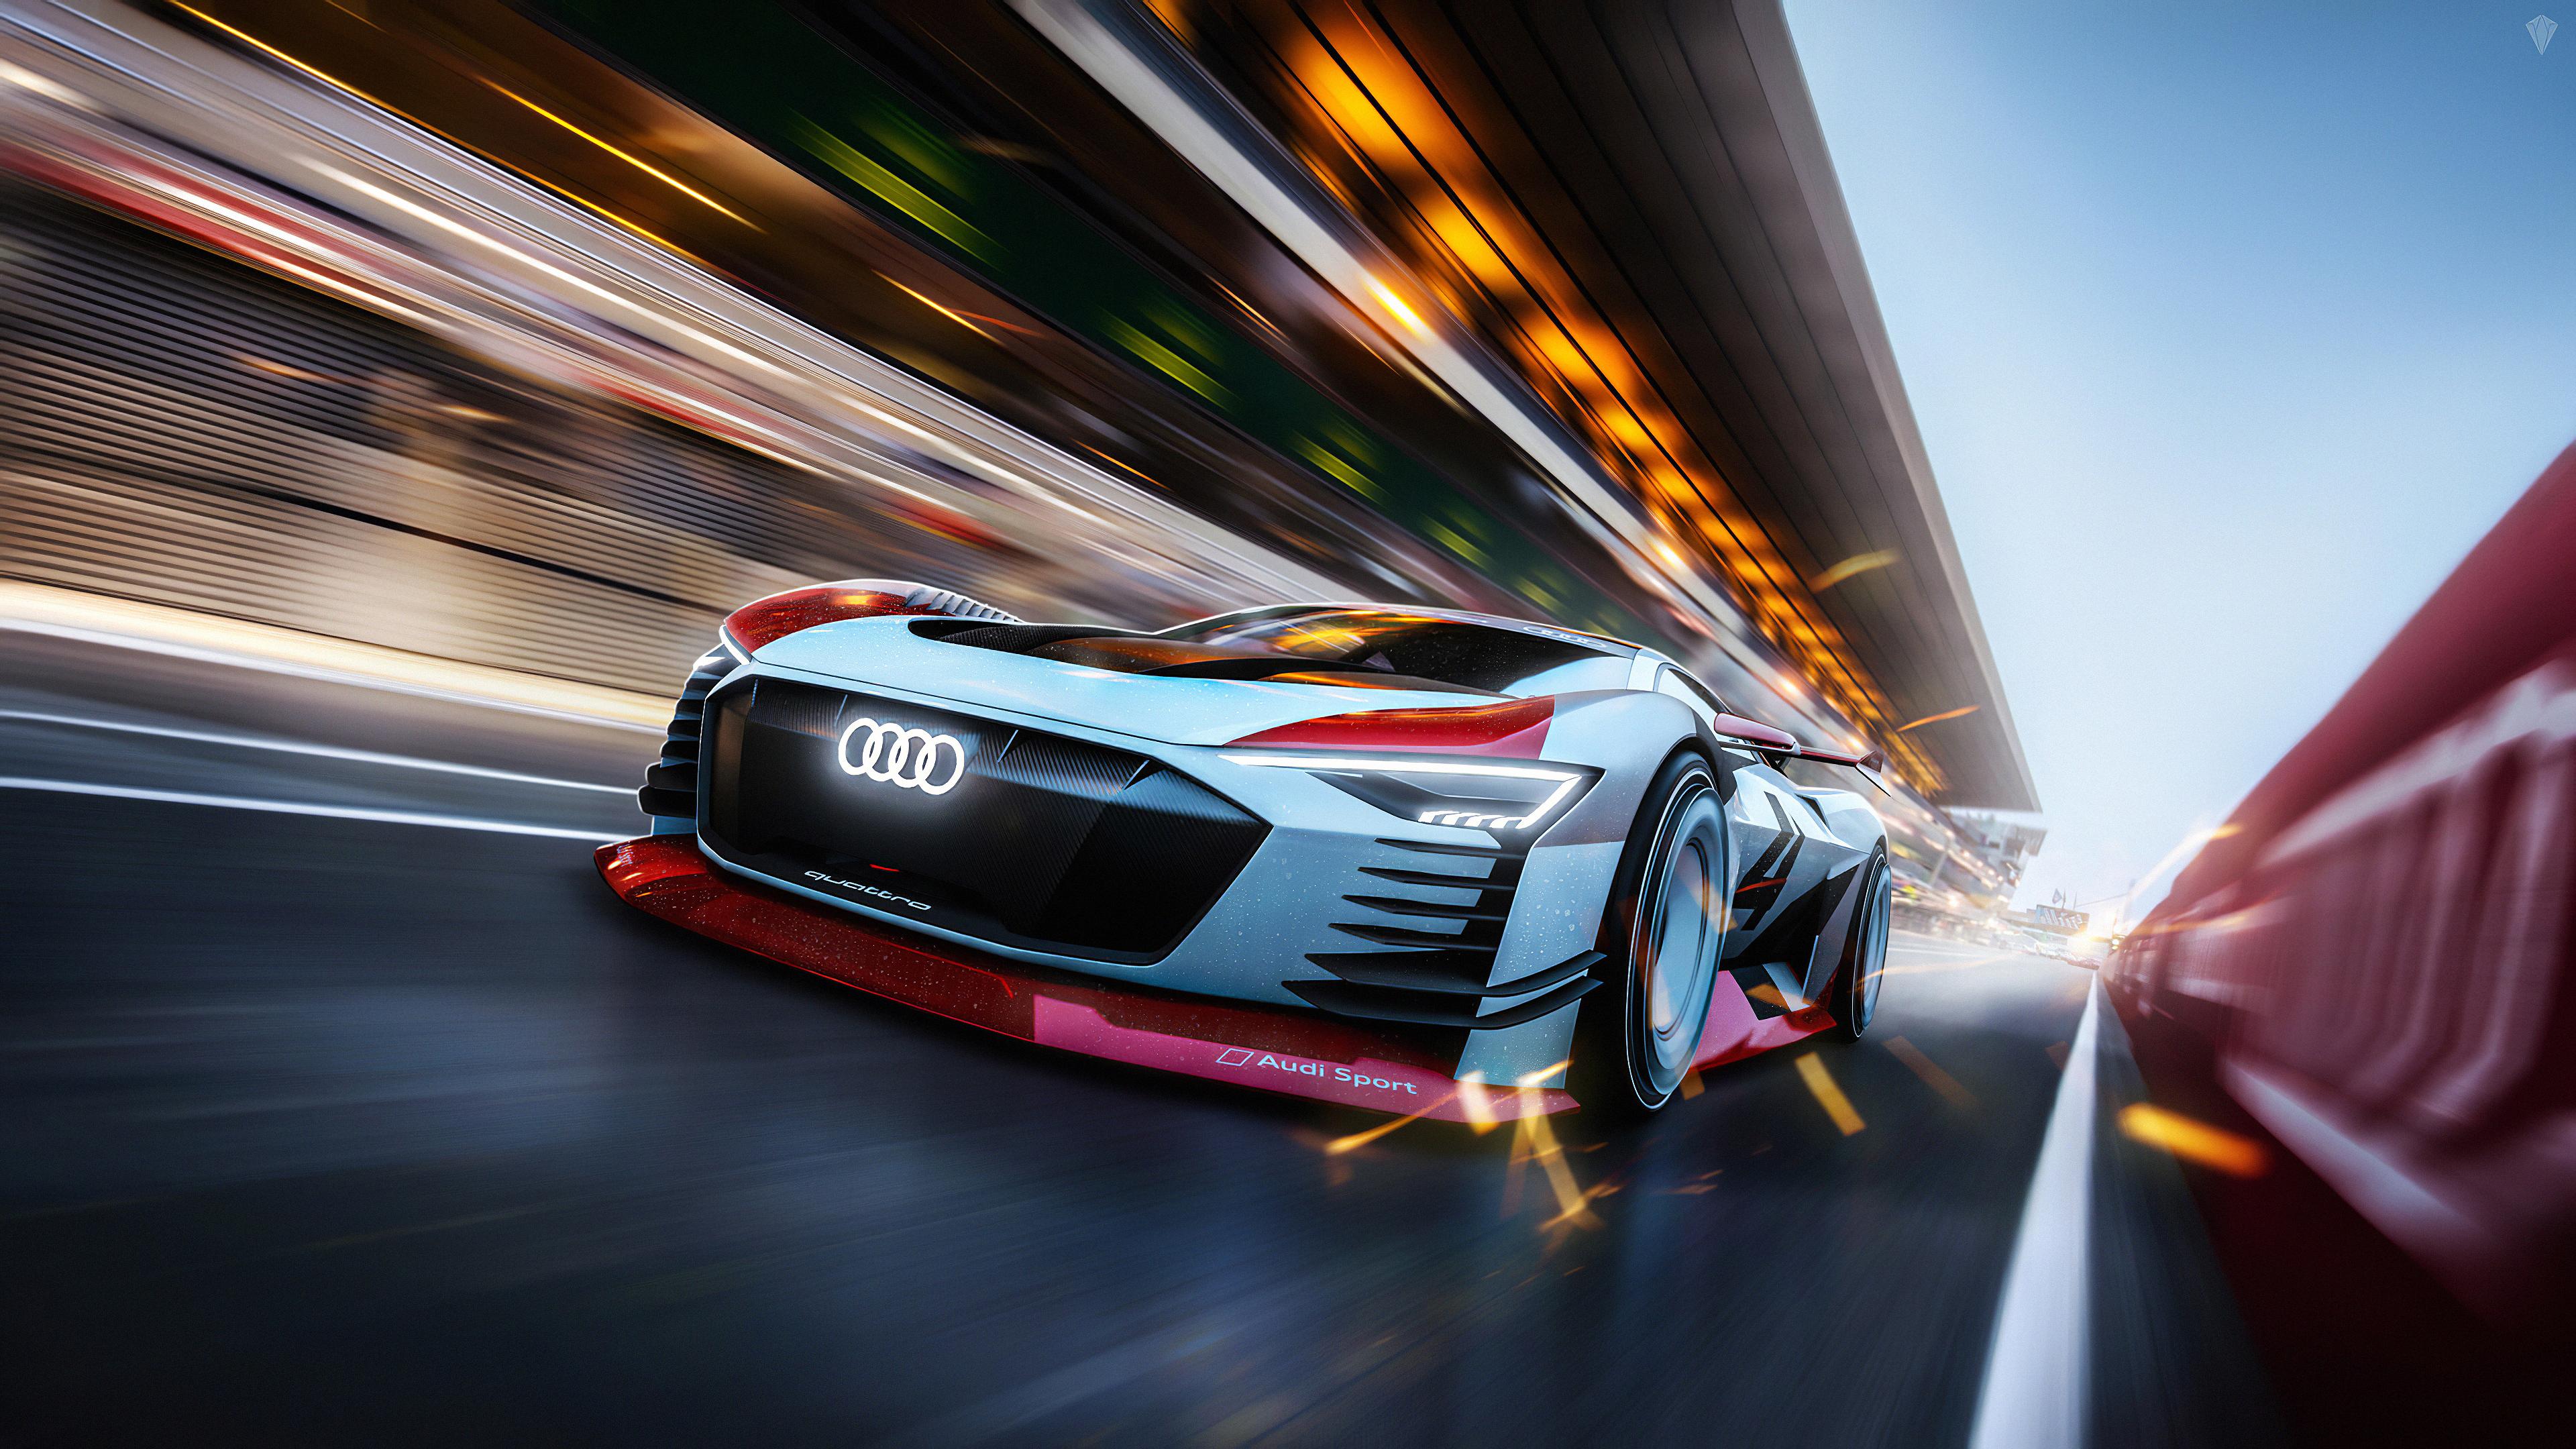 audi e tron 1577653288 - Audi E Tron - Audi E Tron wallpaper 4k, Audi E Tron wallpaper, Audi E Tron 4k wallpaper